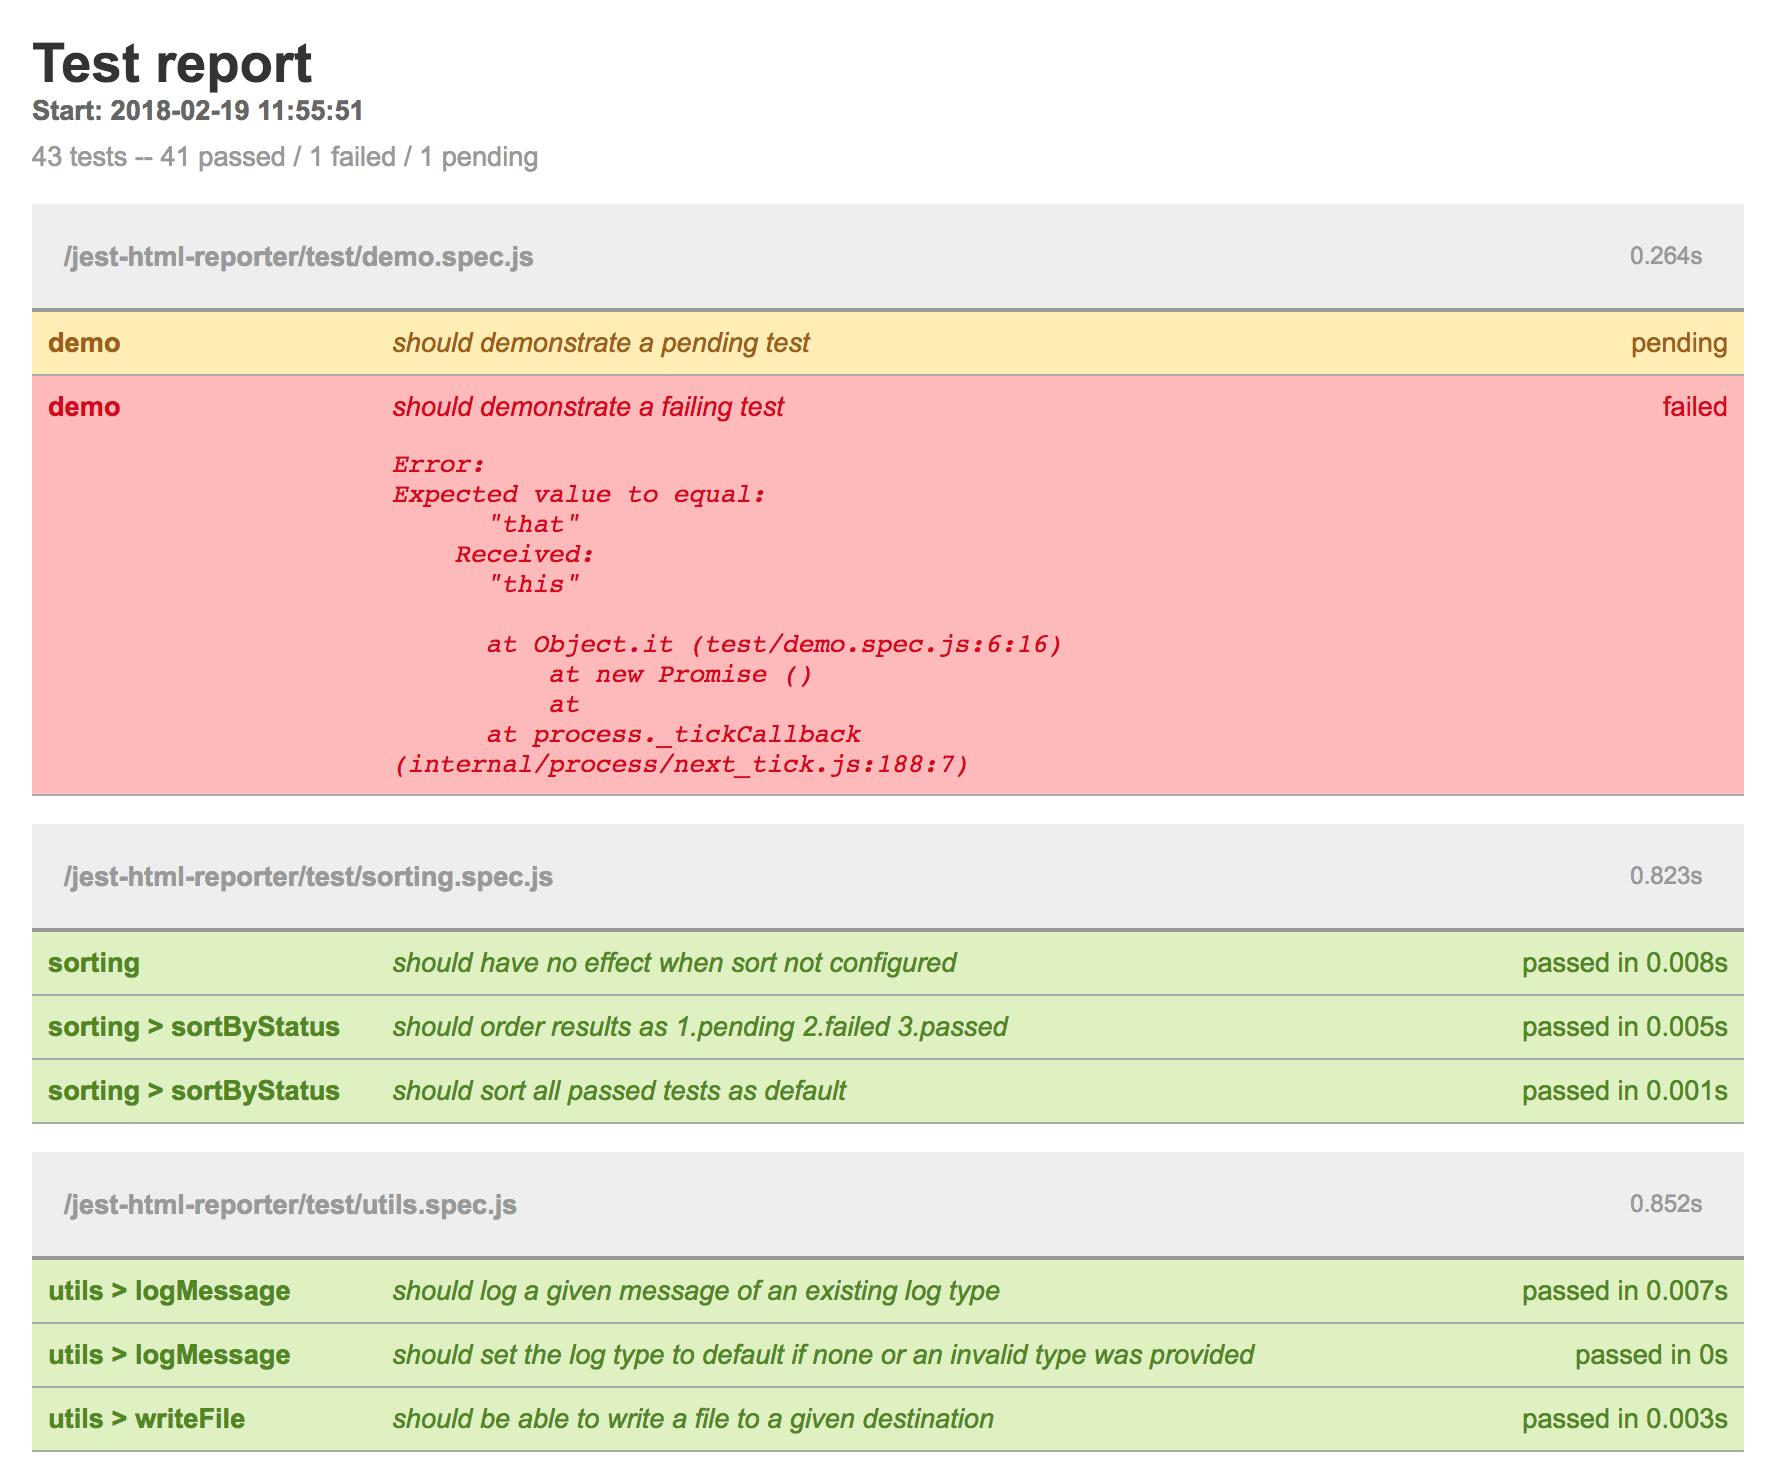 jest-html-reporter - npm